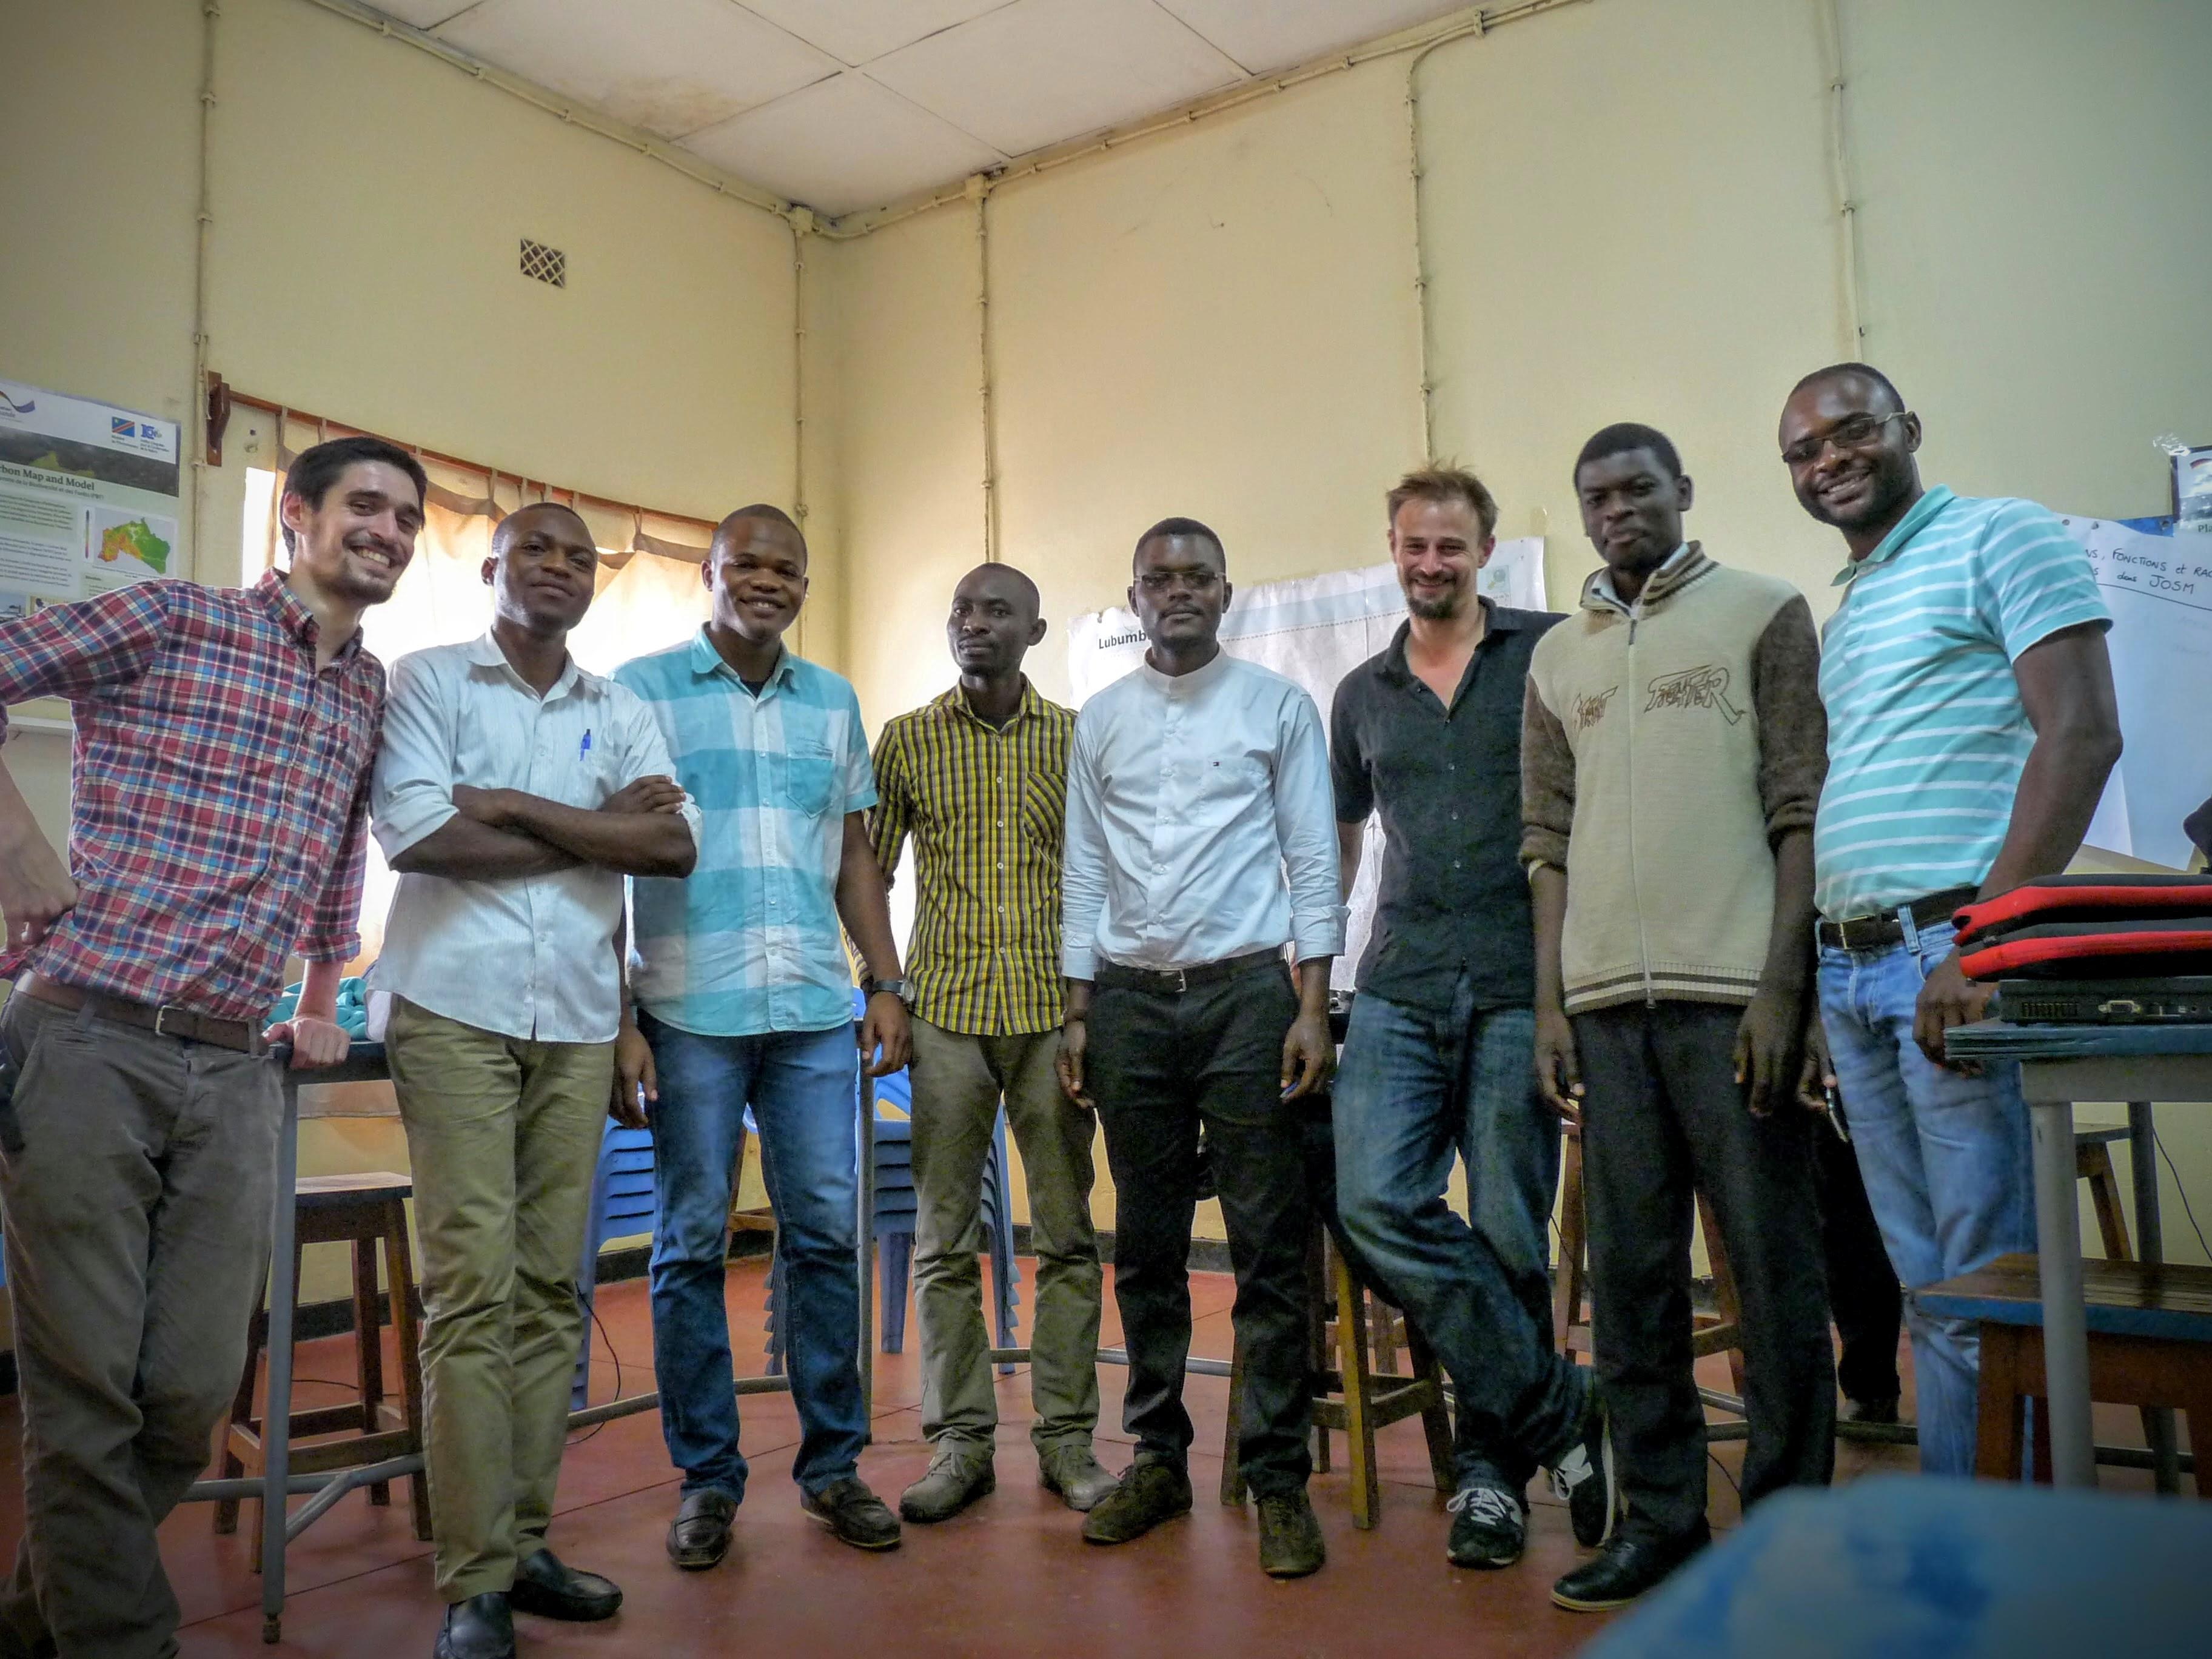 Uni of Lubumbashi guys in Congo